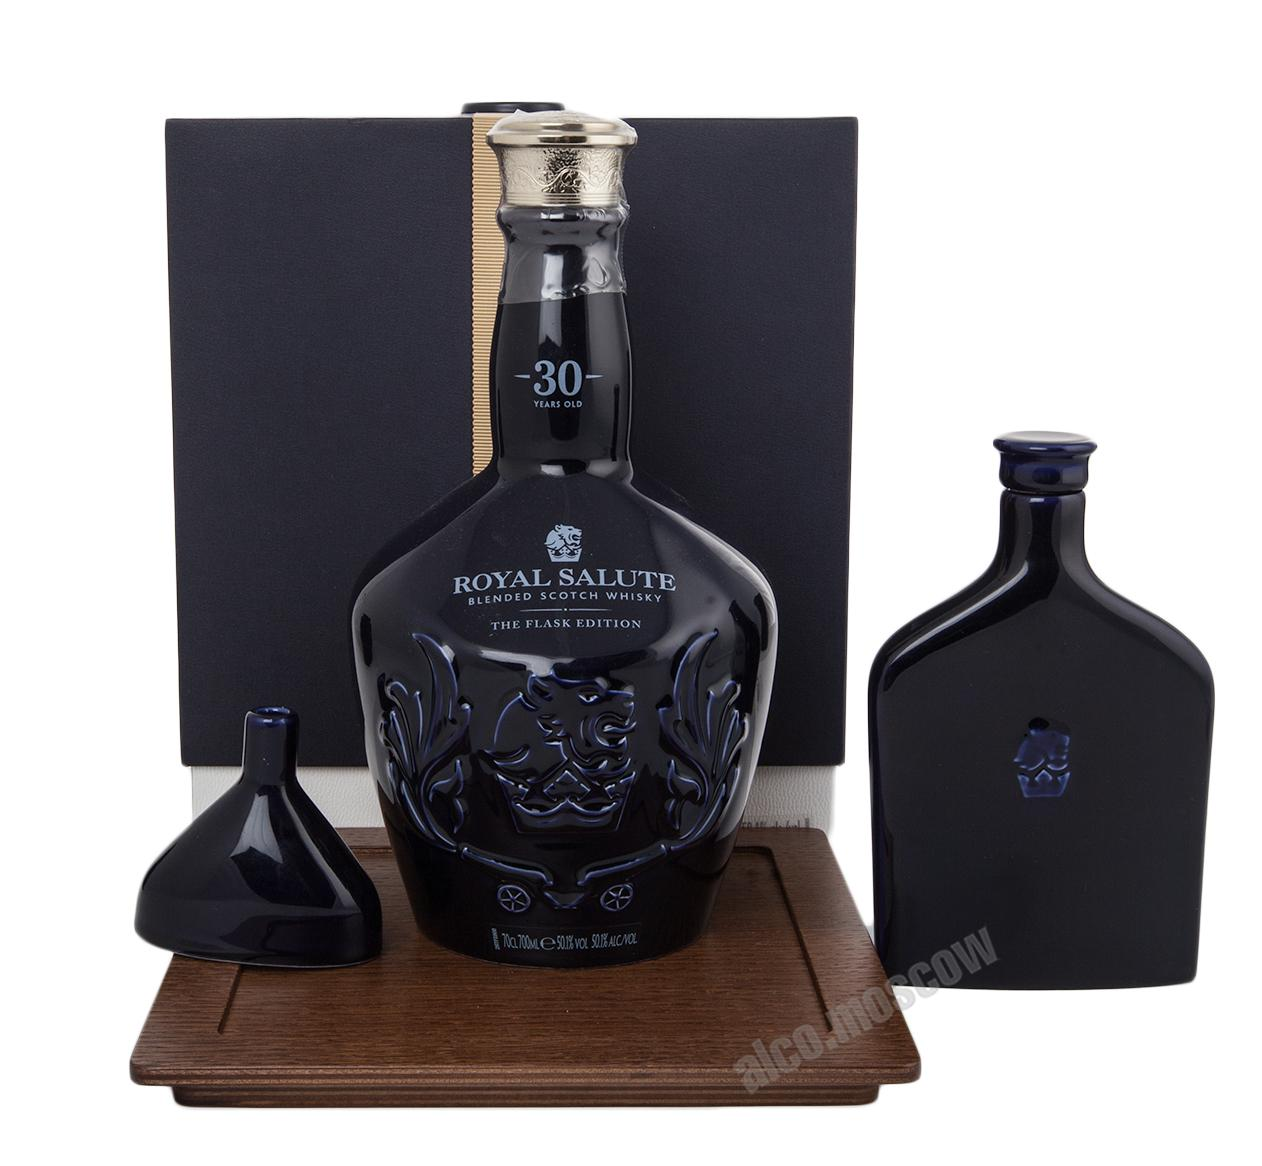 Chivas Regal Виски купаж. Роял Салют 30лет Фласк Эдишн